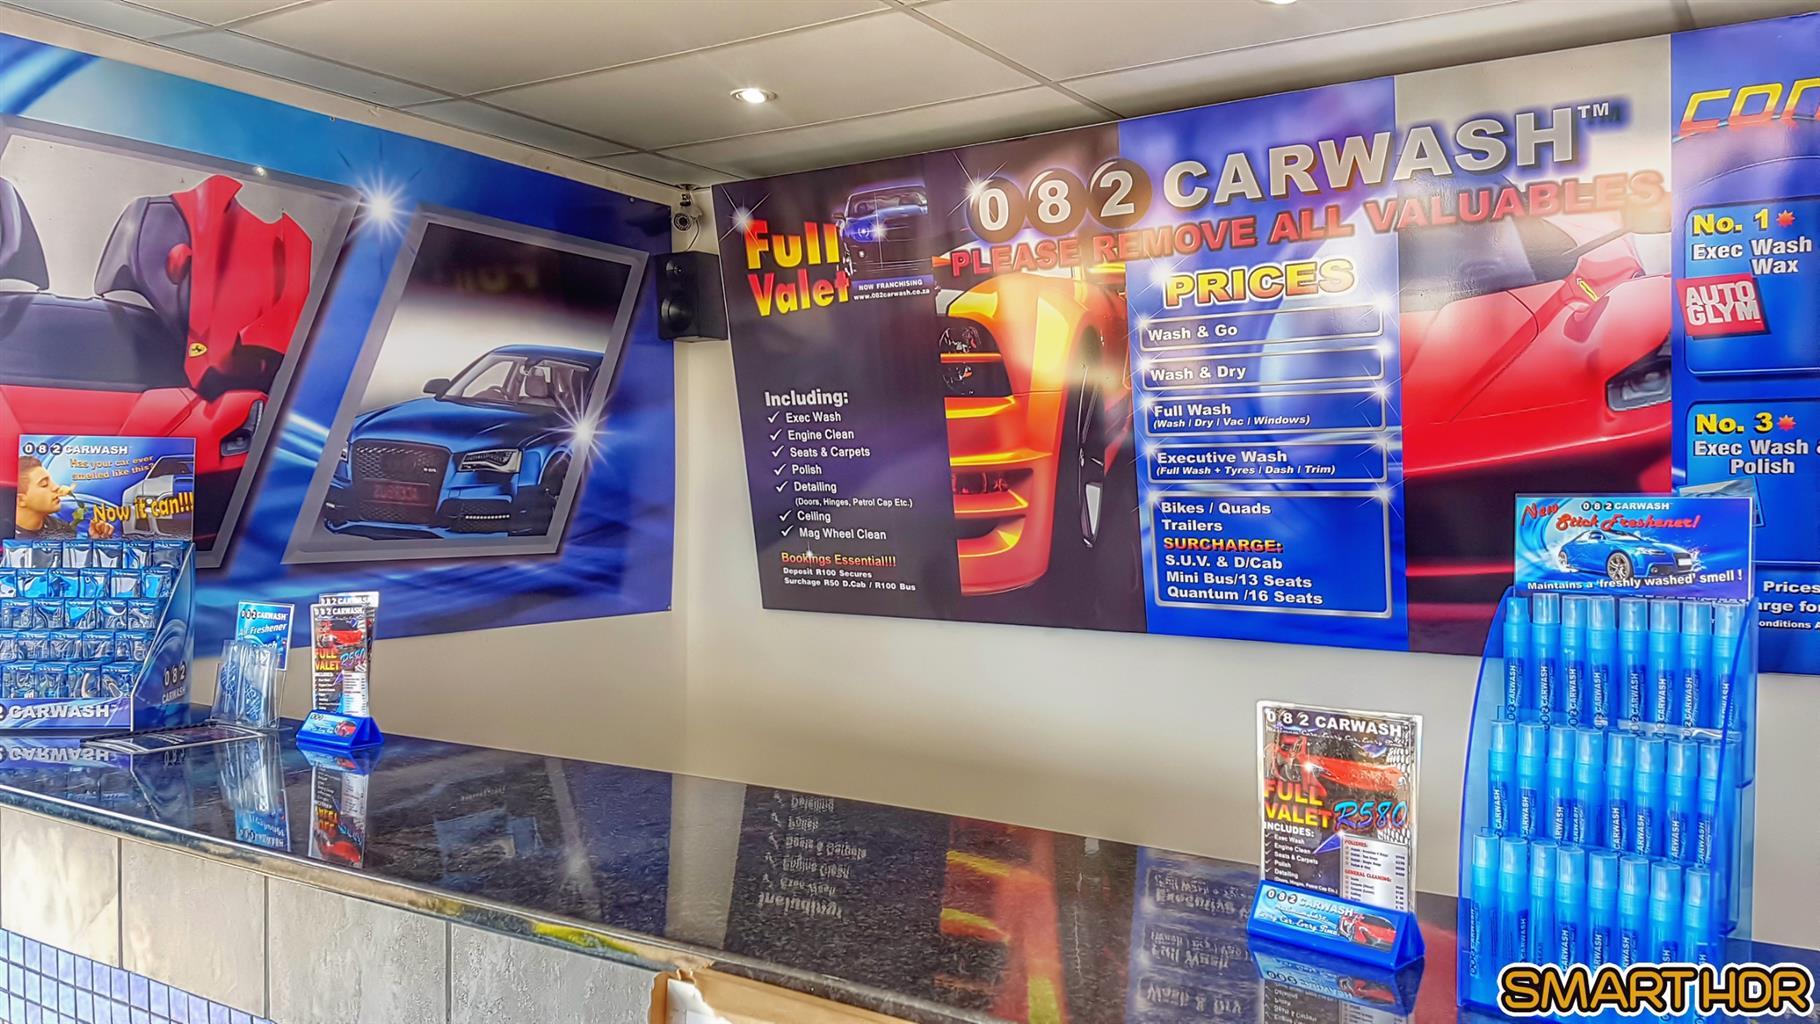 New 082CARWASH franchise to be established - Westgate area